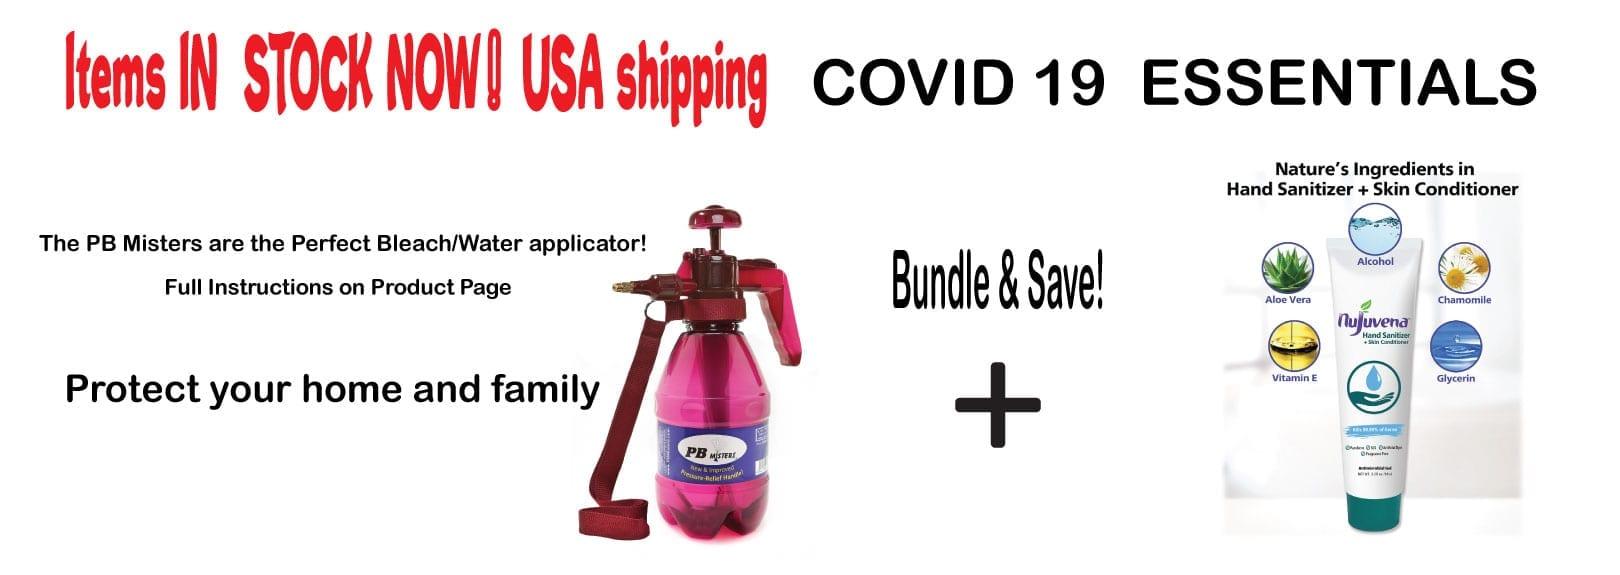 Covid-19 Essentials Bundle Offer